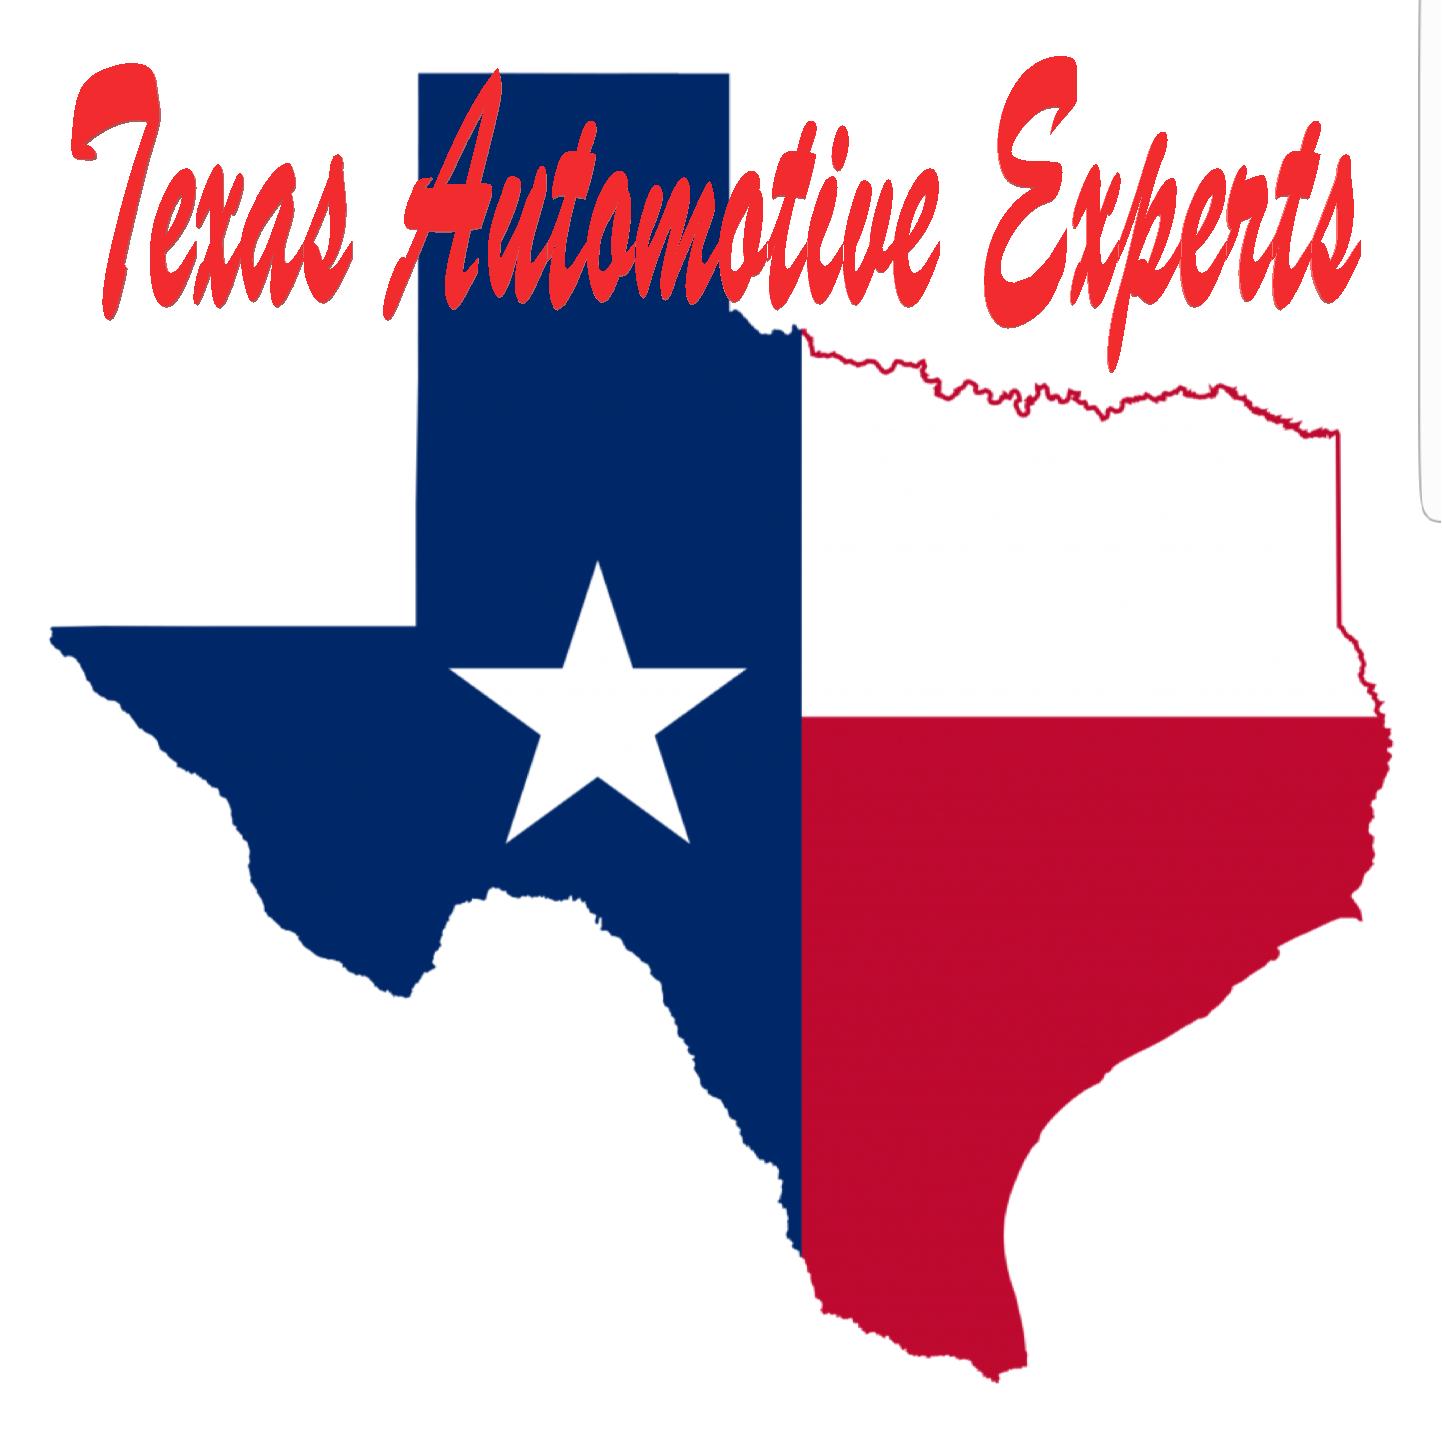 Texas Automotive Experts - Spring, TX - General Auto Repair & Service